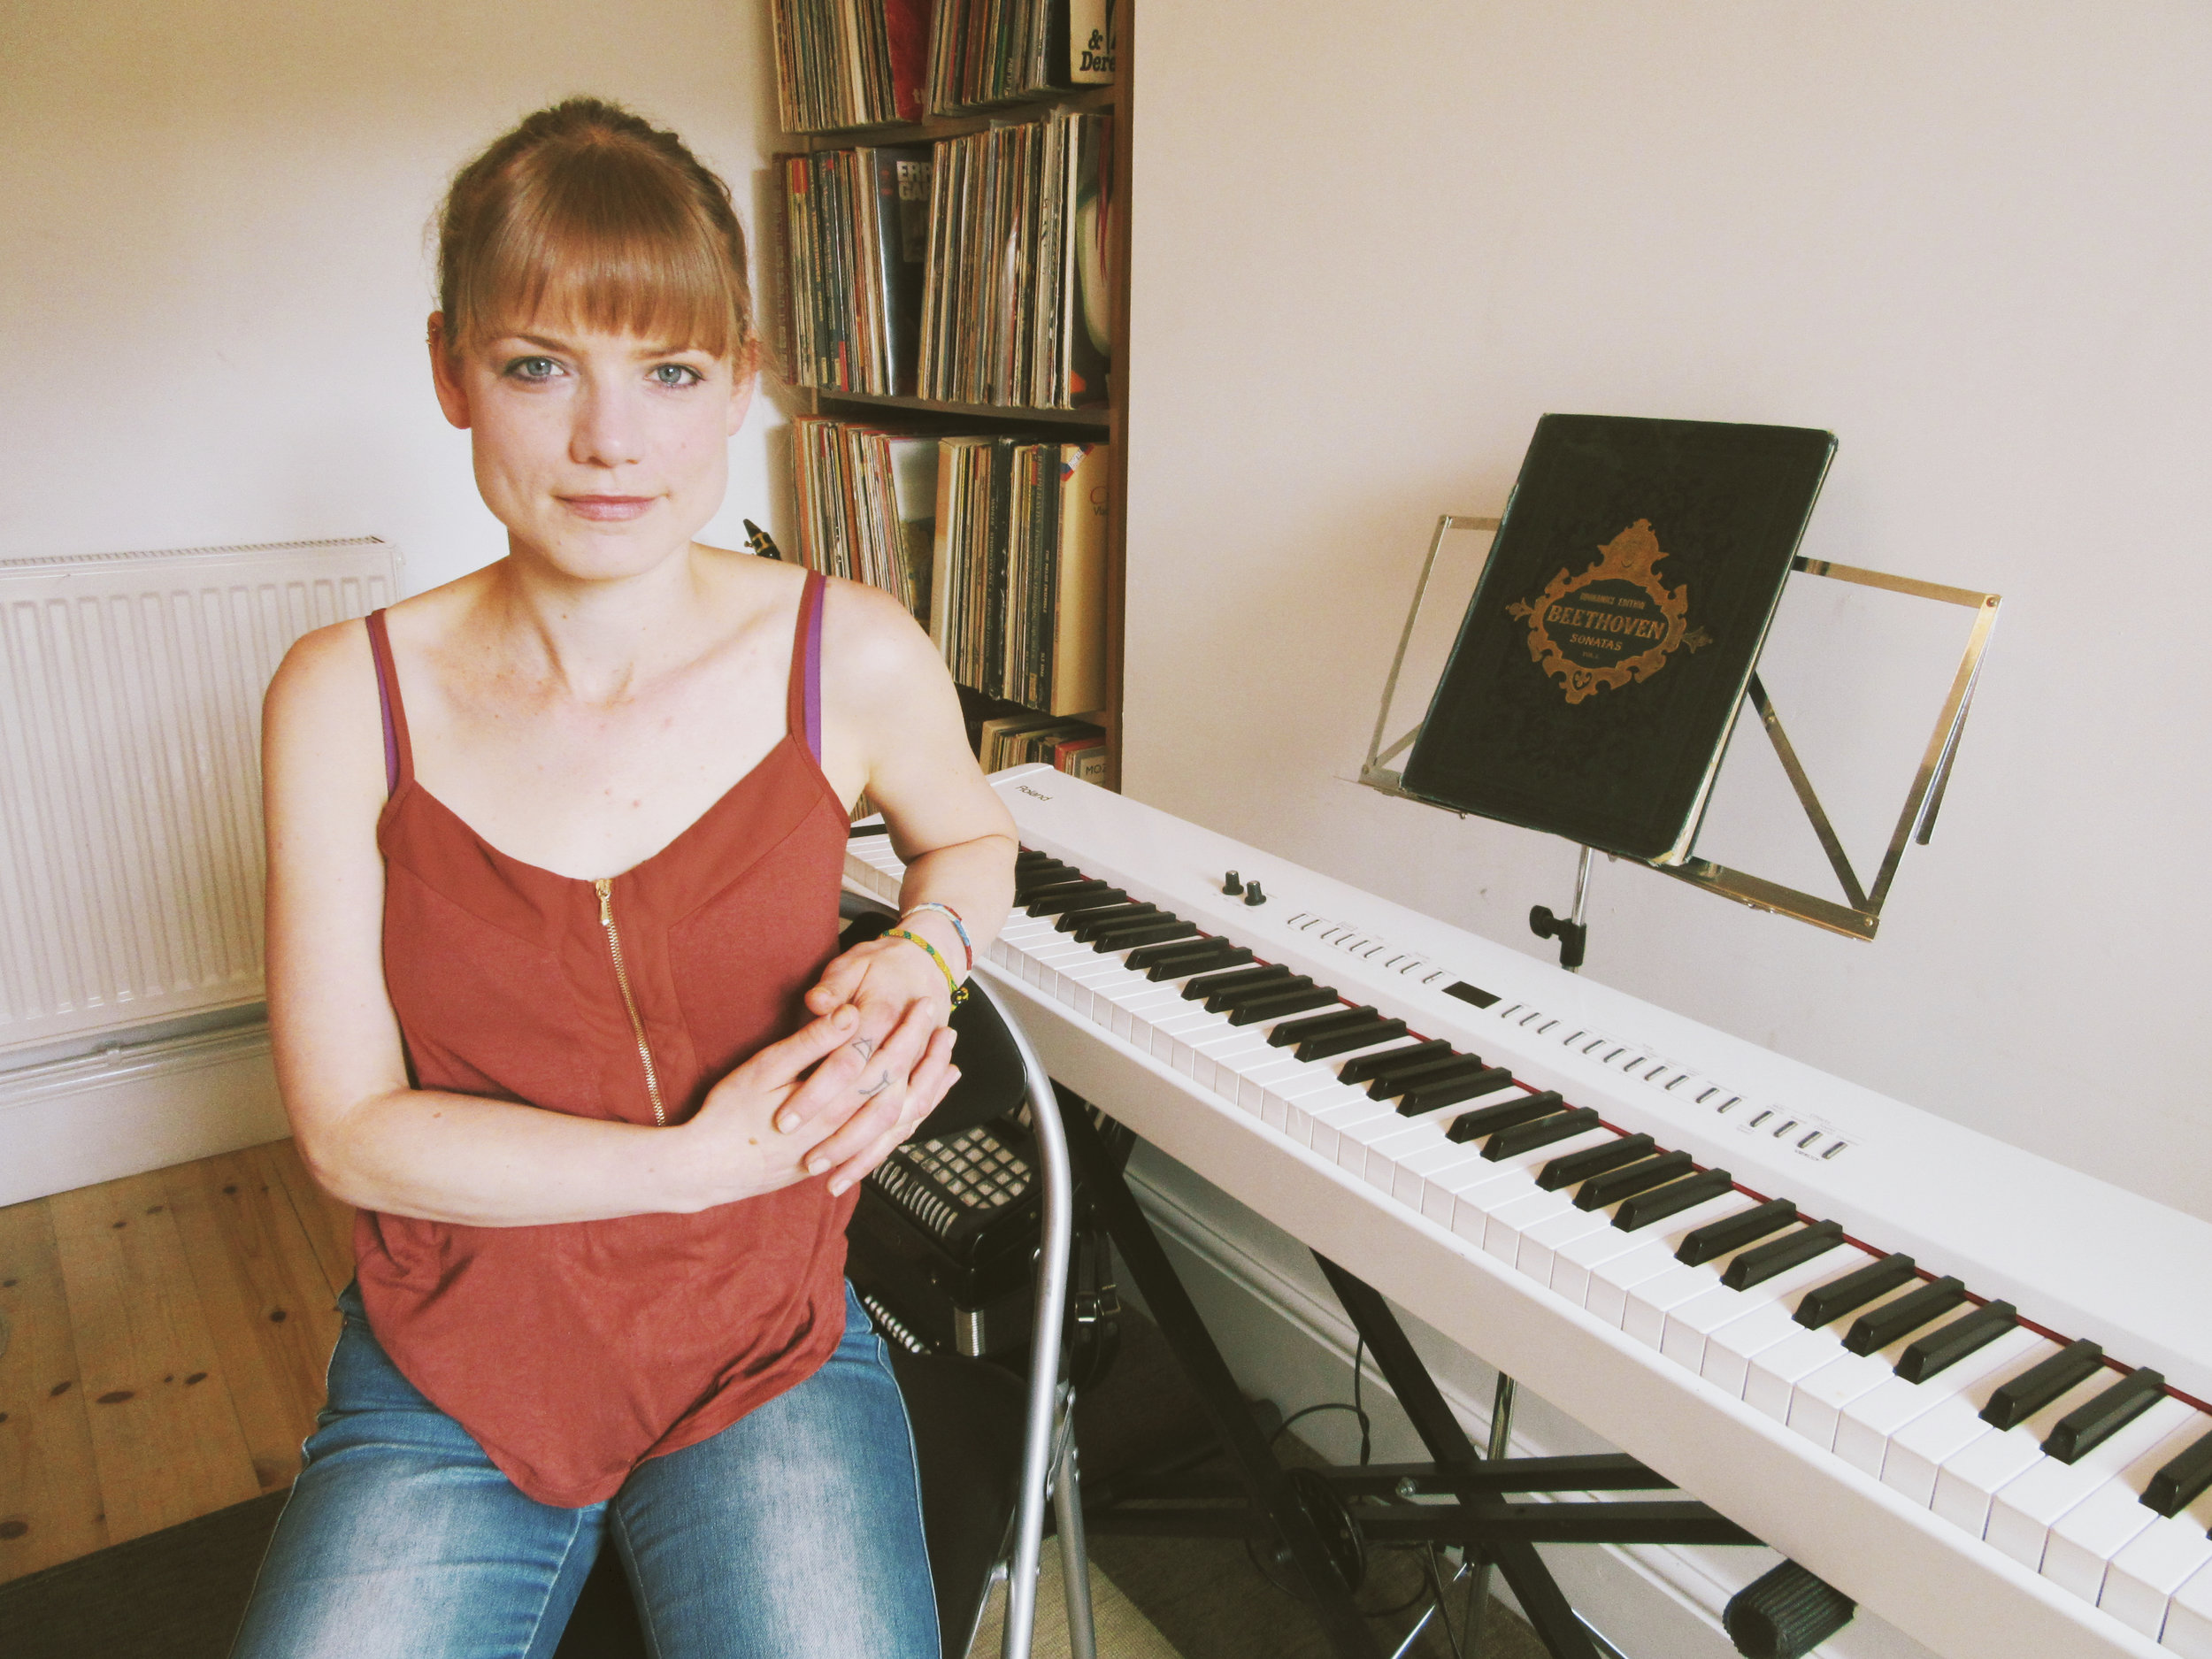 kit in piano room.jpeg